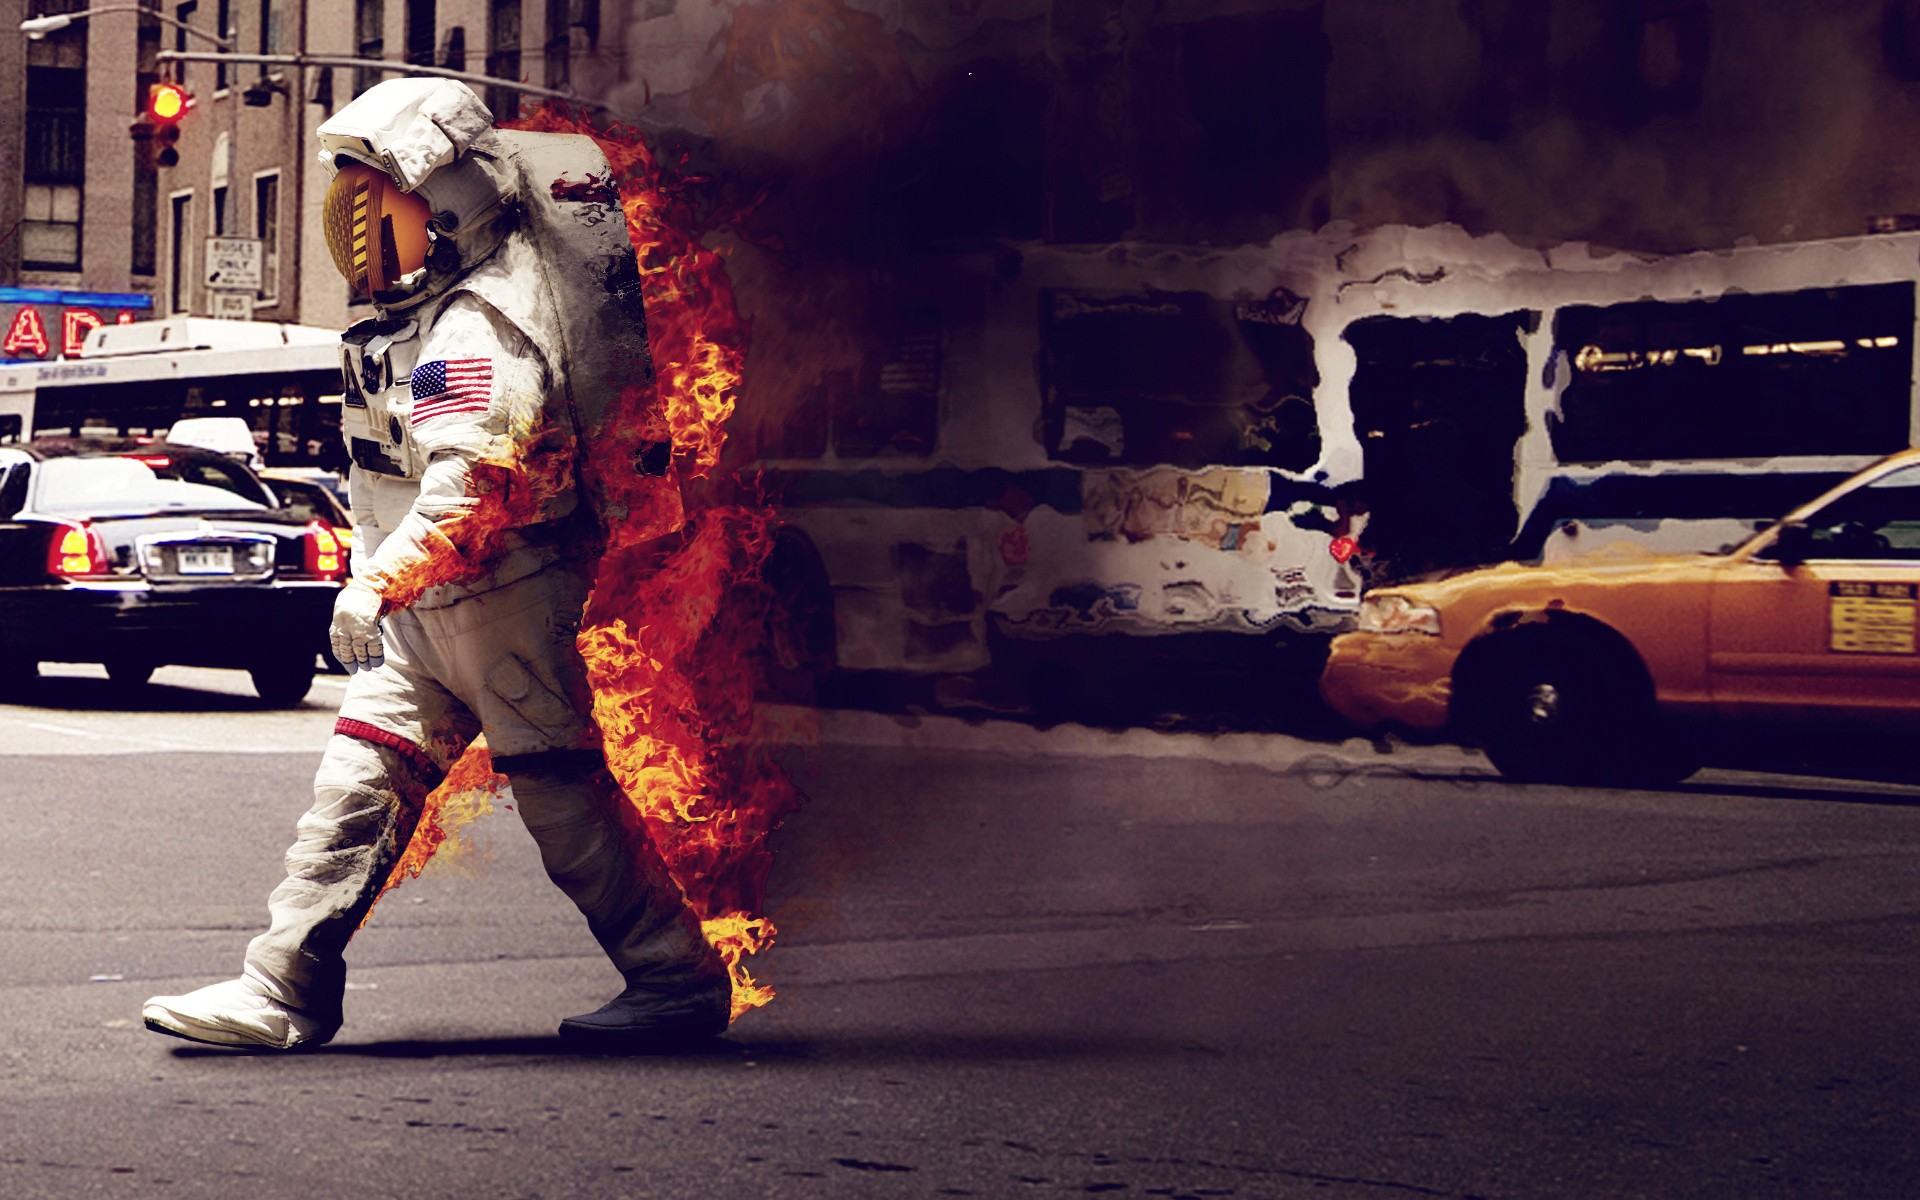 General 1920x1200 astronaut fire humor spacesuit USA traffic smoke road city digital art street burning burn space suit NASA space New York City